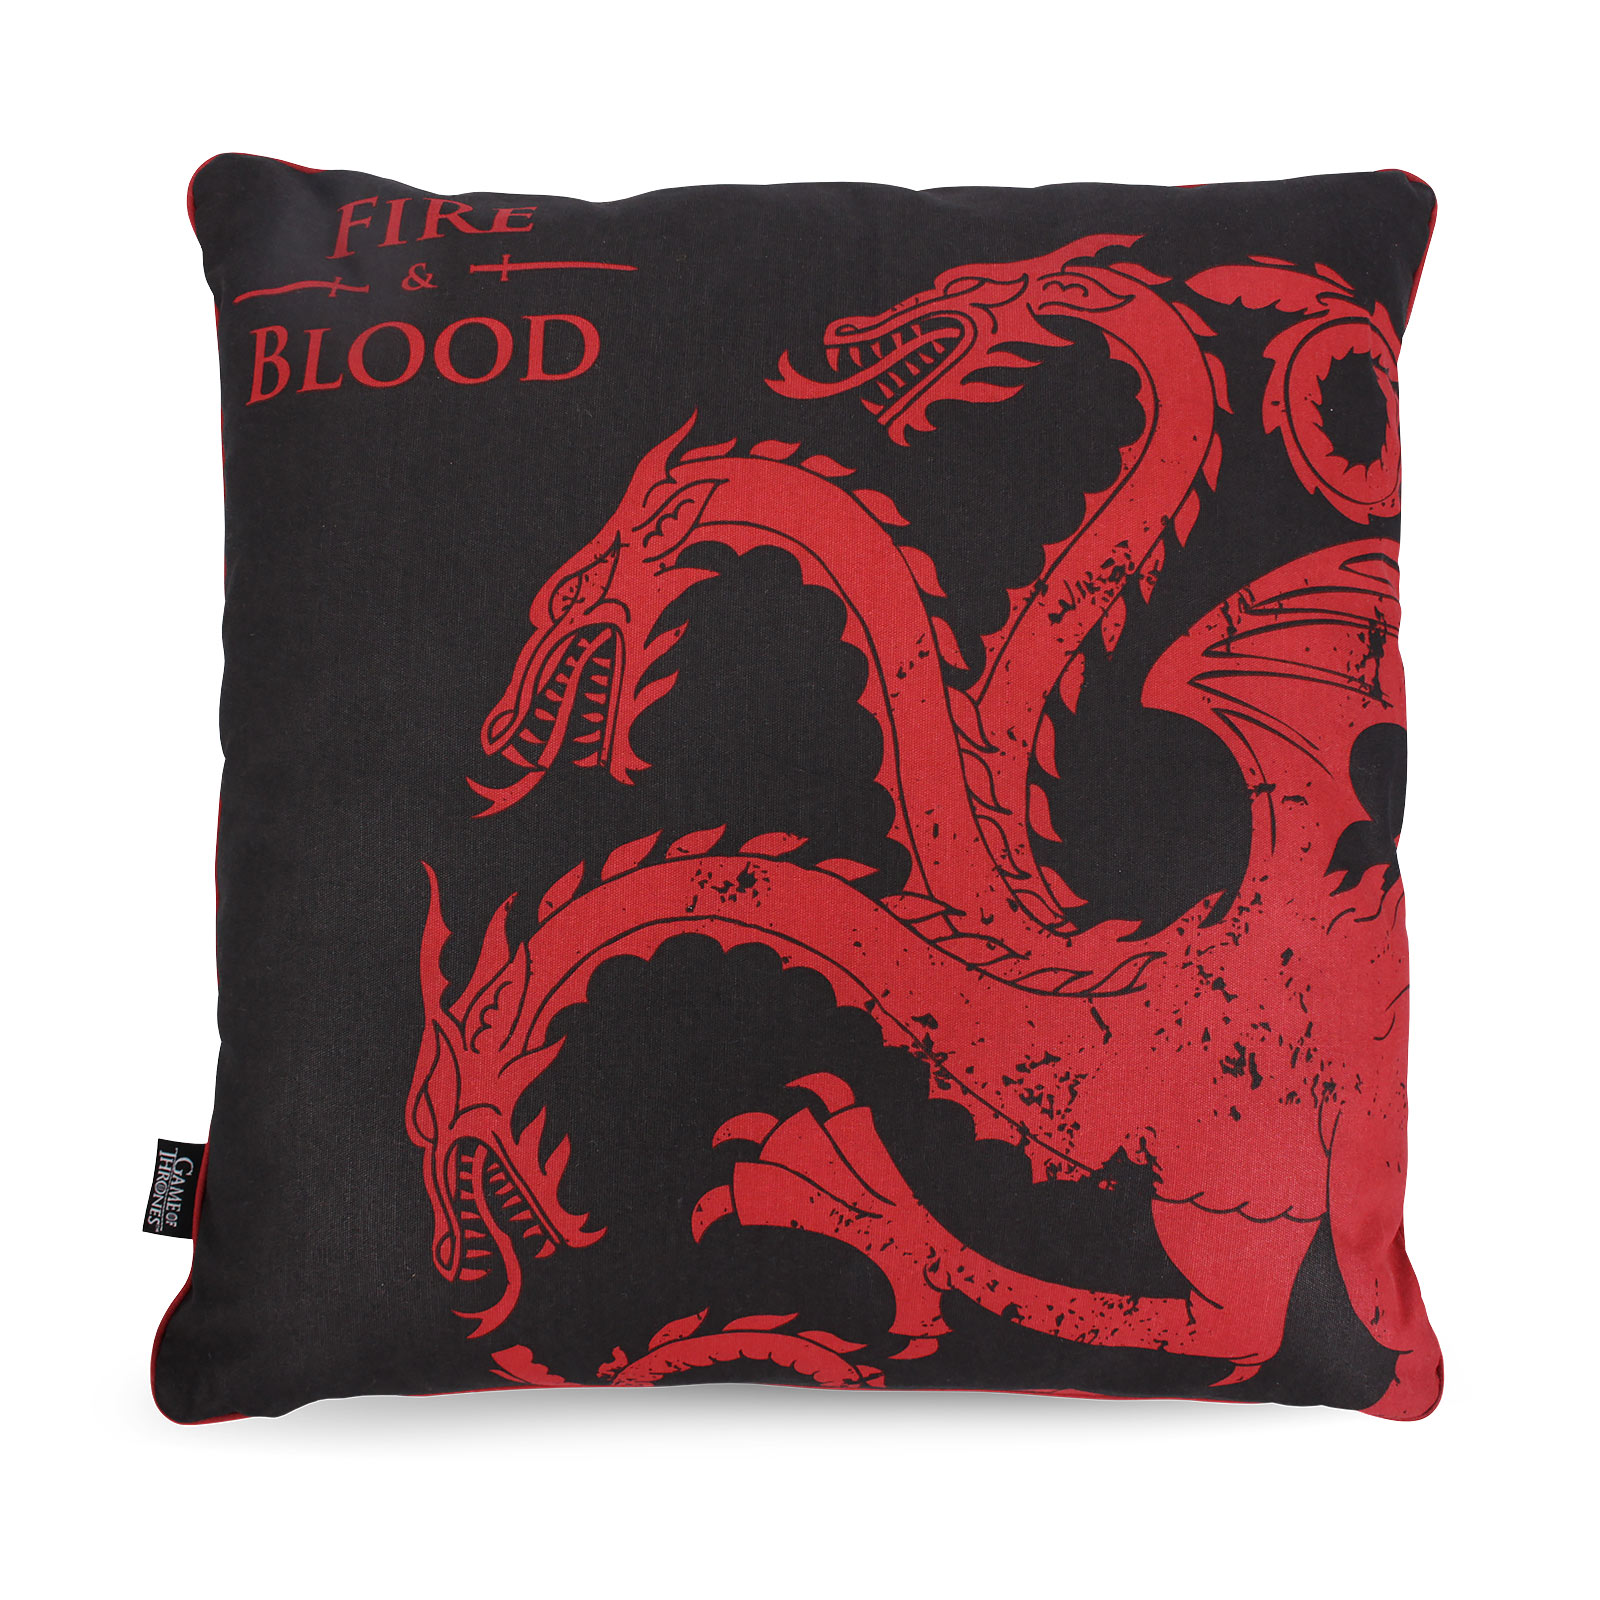 Game of Thrones - Targaryen Fire and Blood Kissen